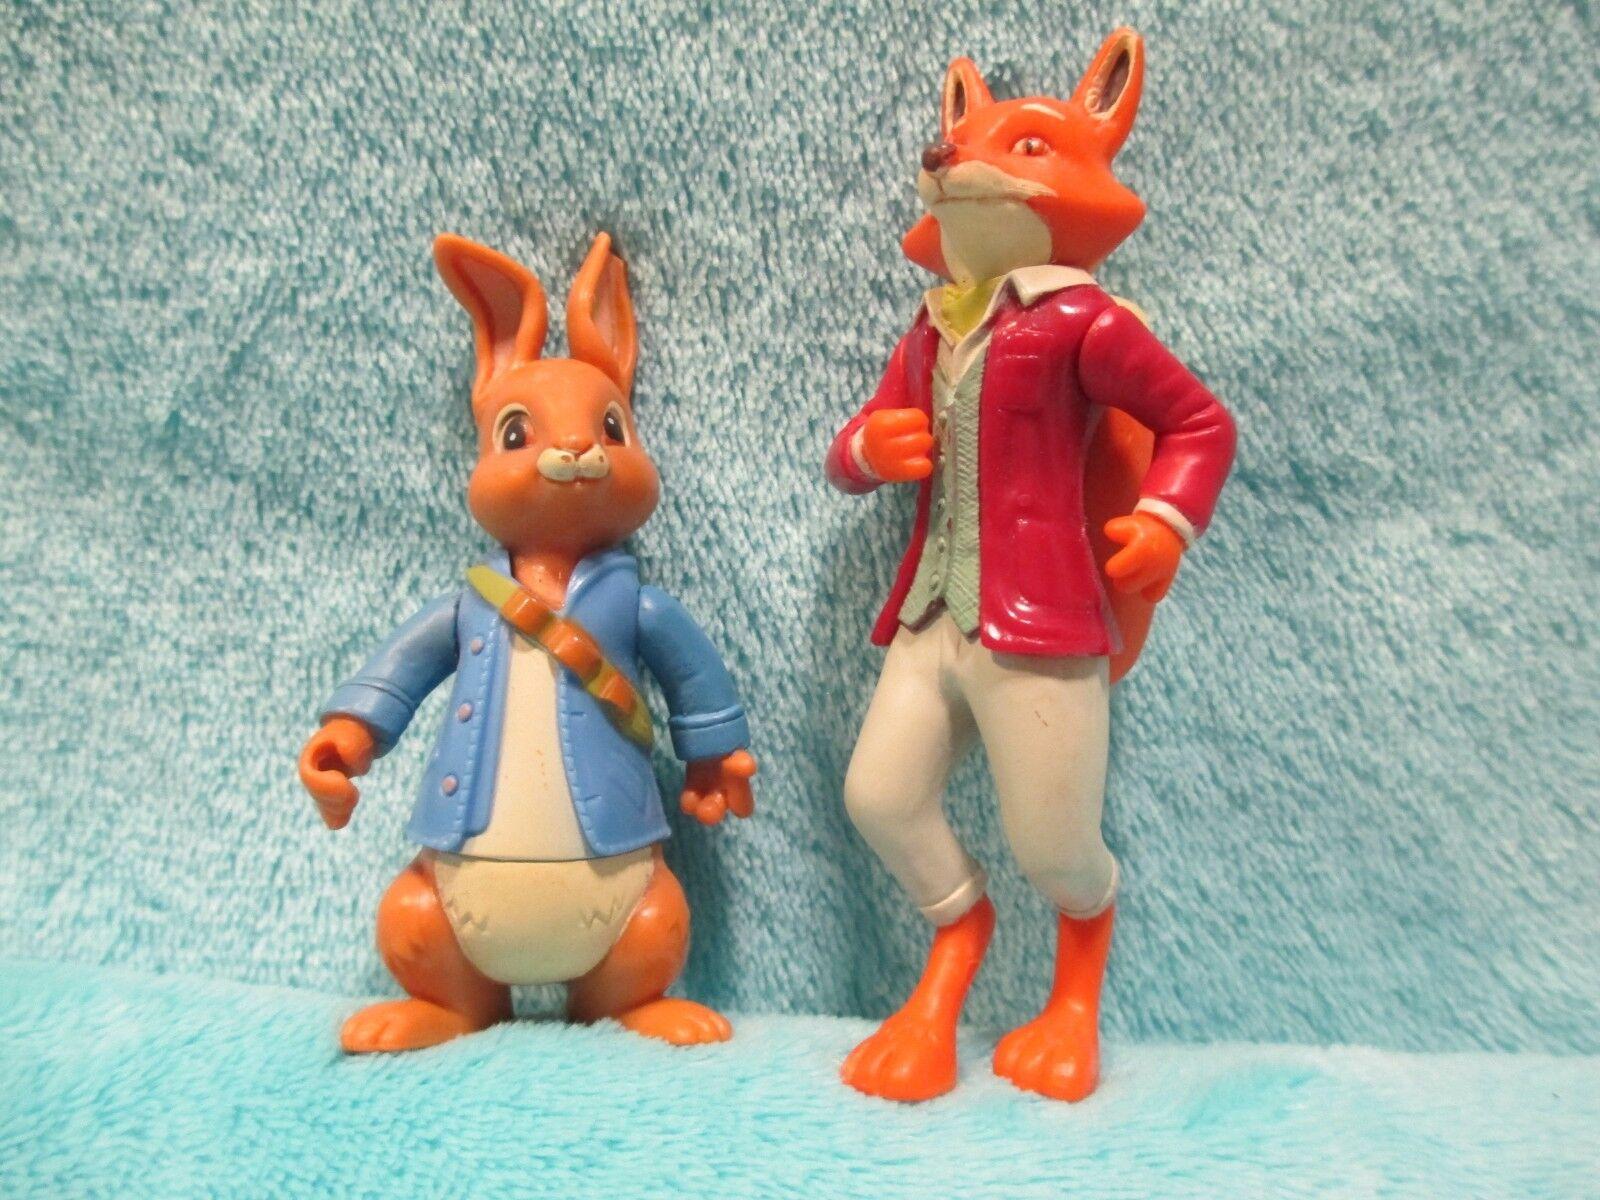 RARE 2013 Peter Rabbit & Friends Friends Friends - Peter + Mr Tod   Todd The Fox Figures Toy Set 5c6bf8